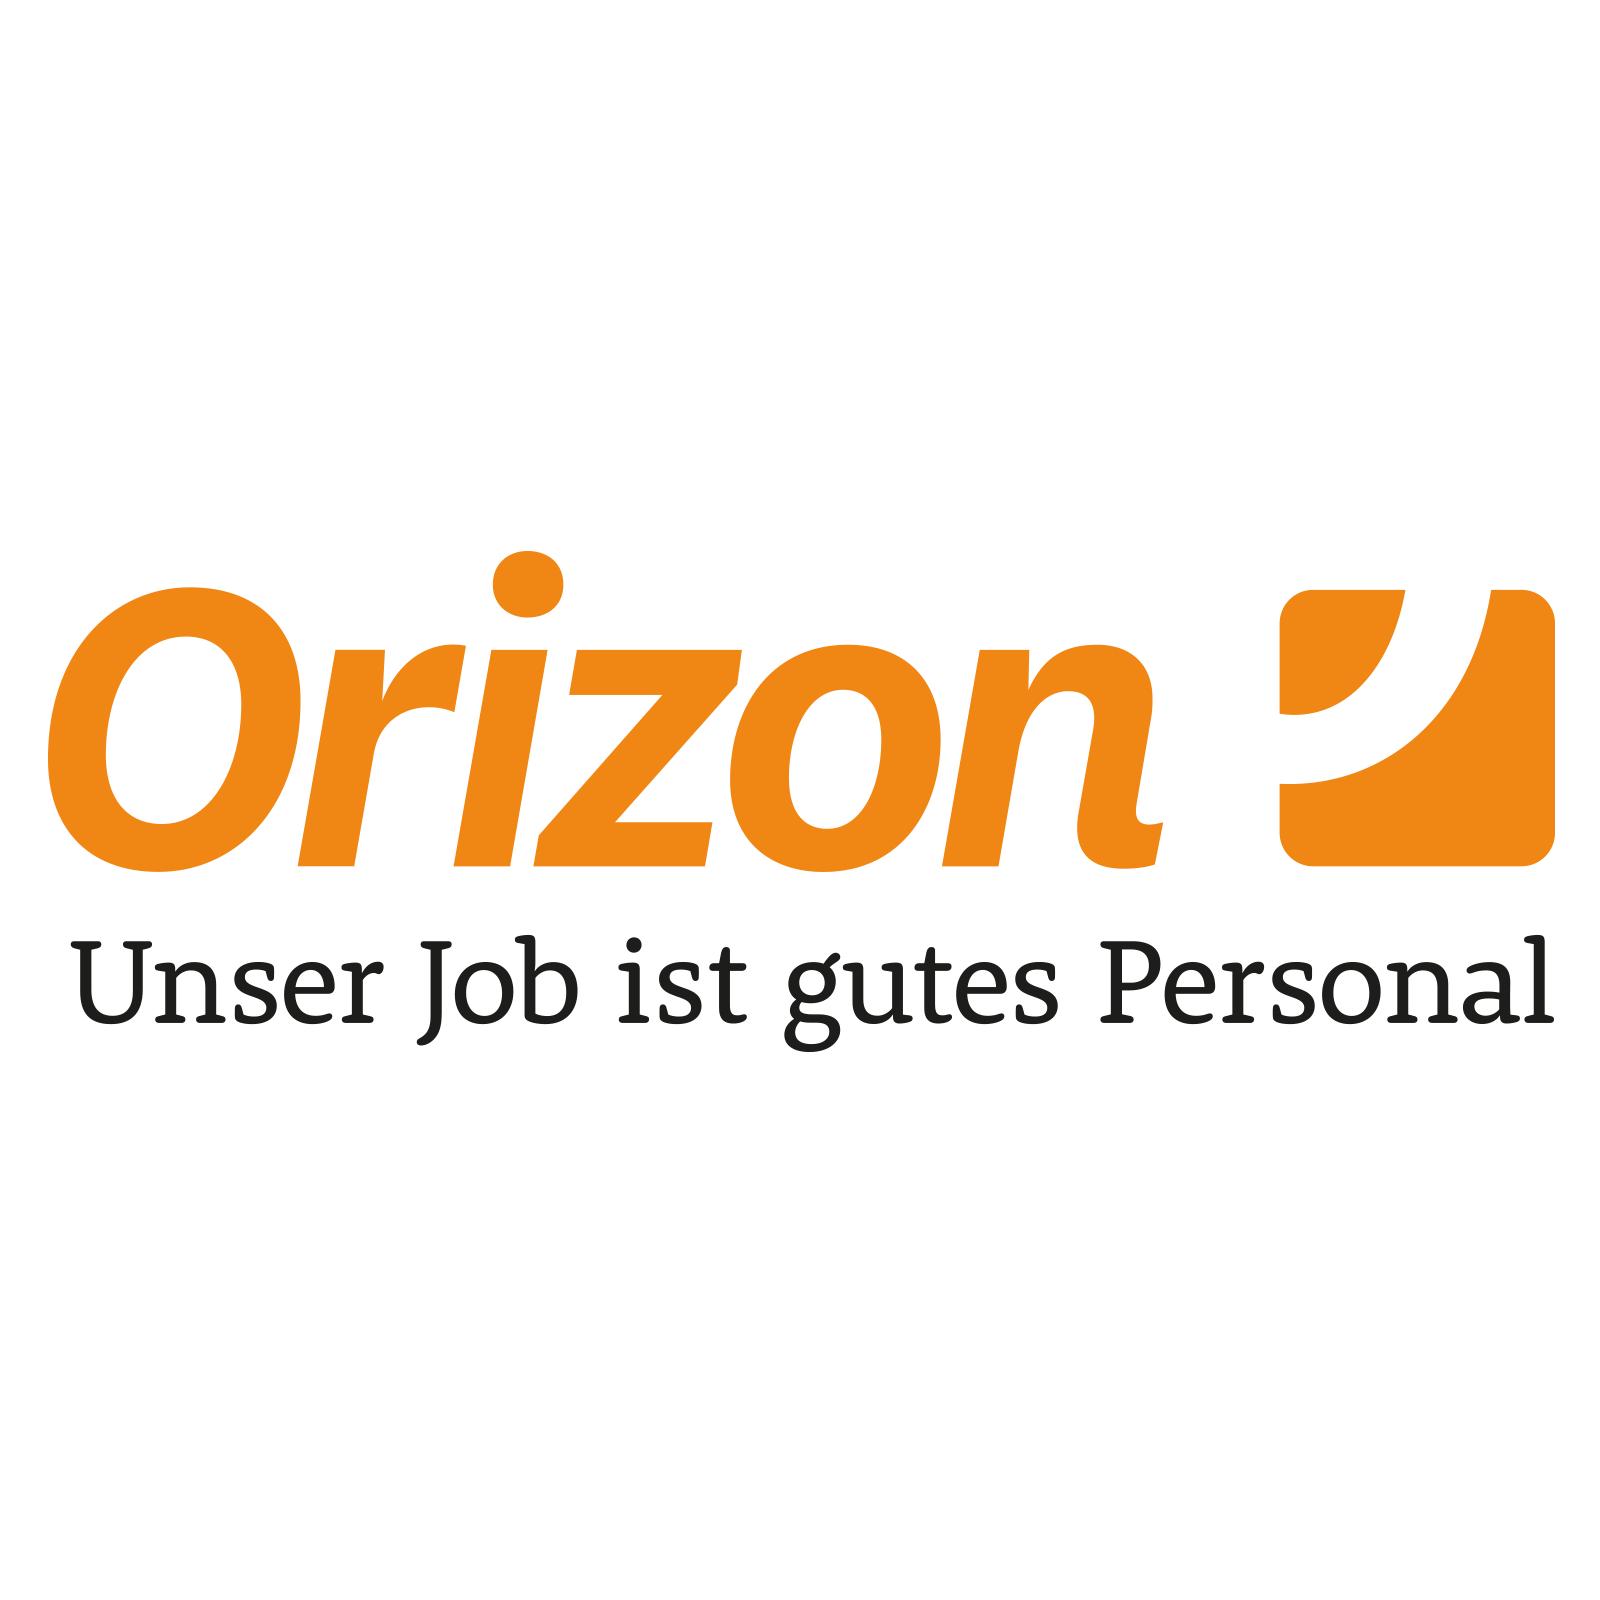 Orizon Personalvermittlung Nürnberg Logo